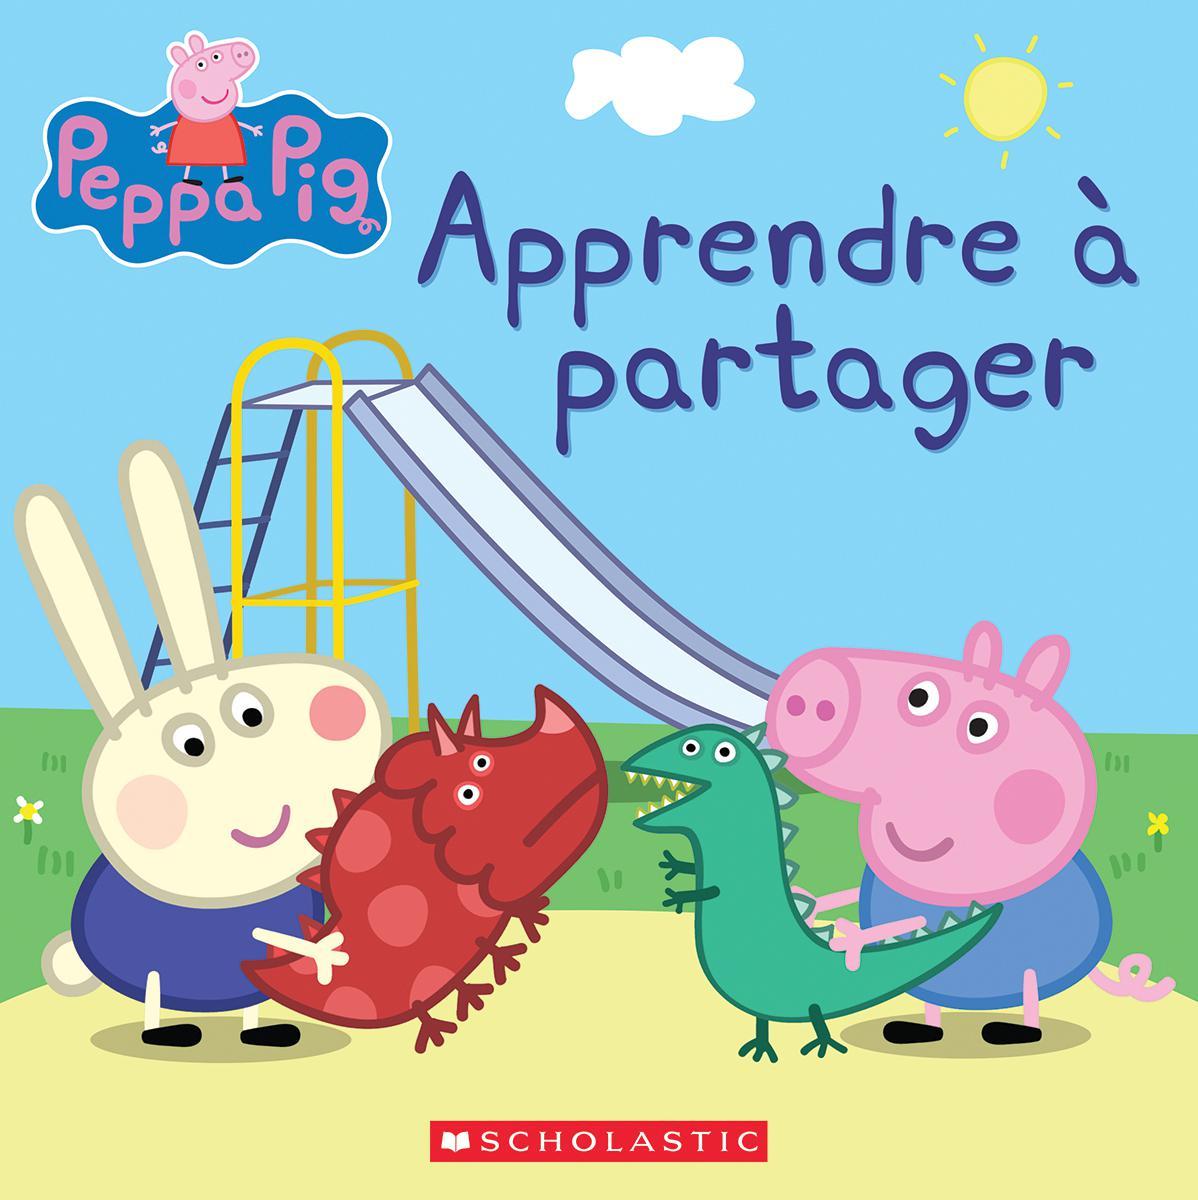 Peppa Pig : Apprendre à partager